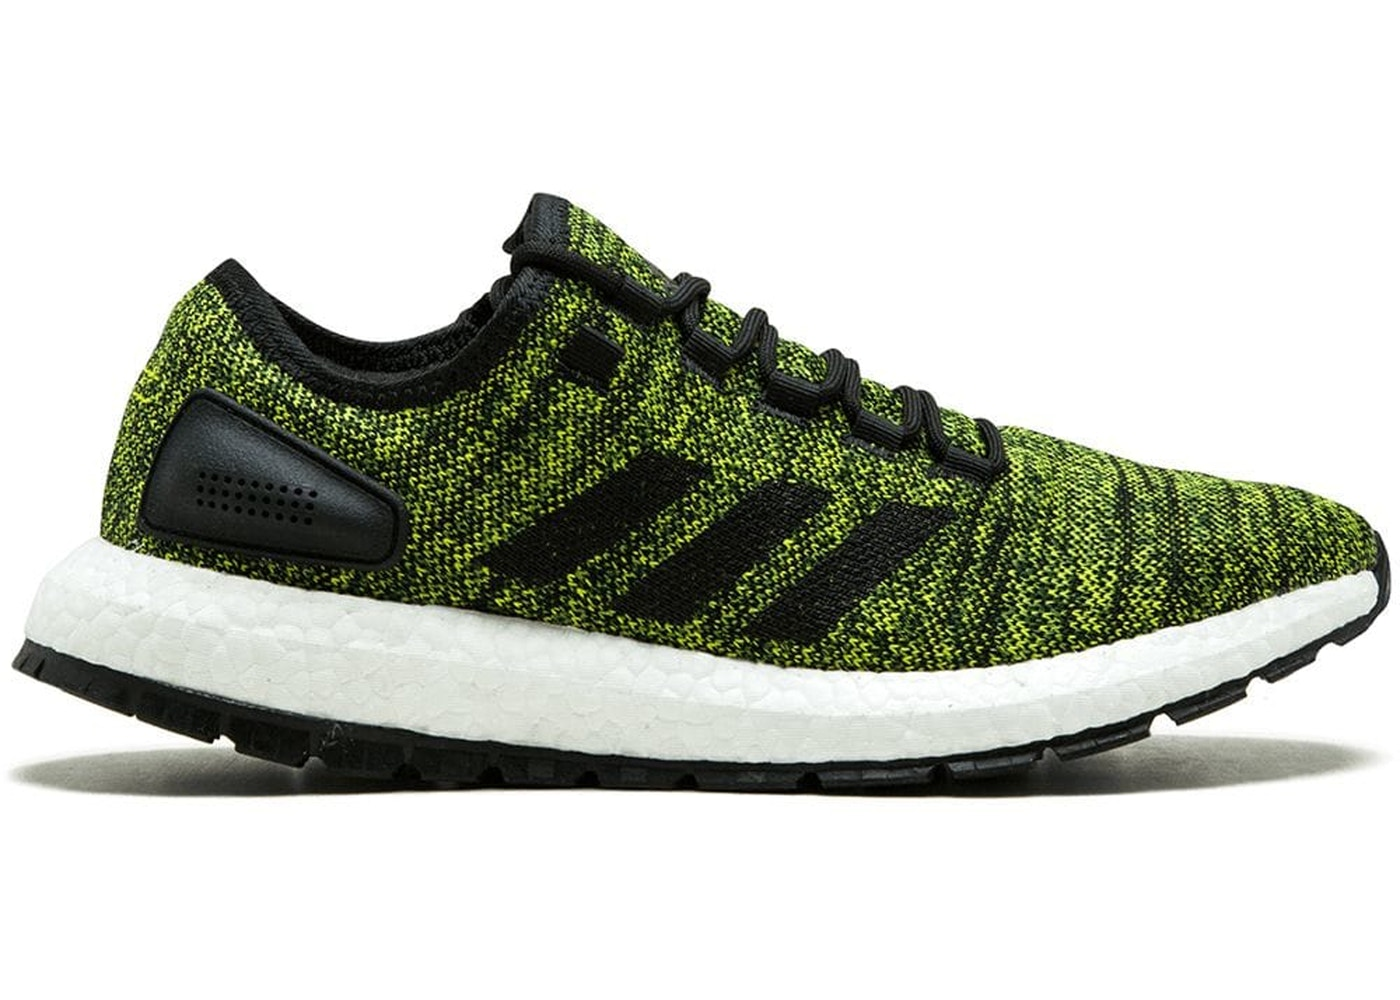 15e764c2c5b Sell. or Ask. Size --. View All Bids. adidas Pureboost All Terrain Green  Black